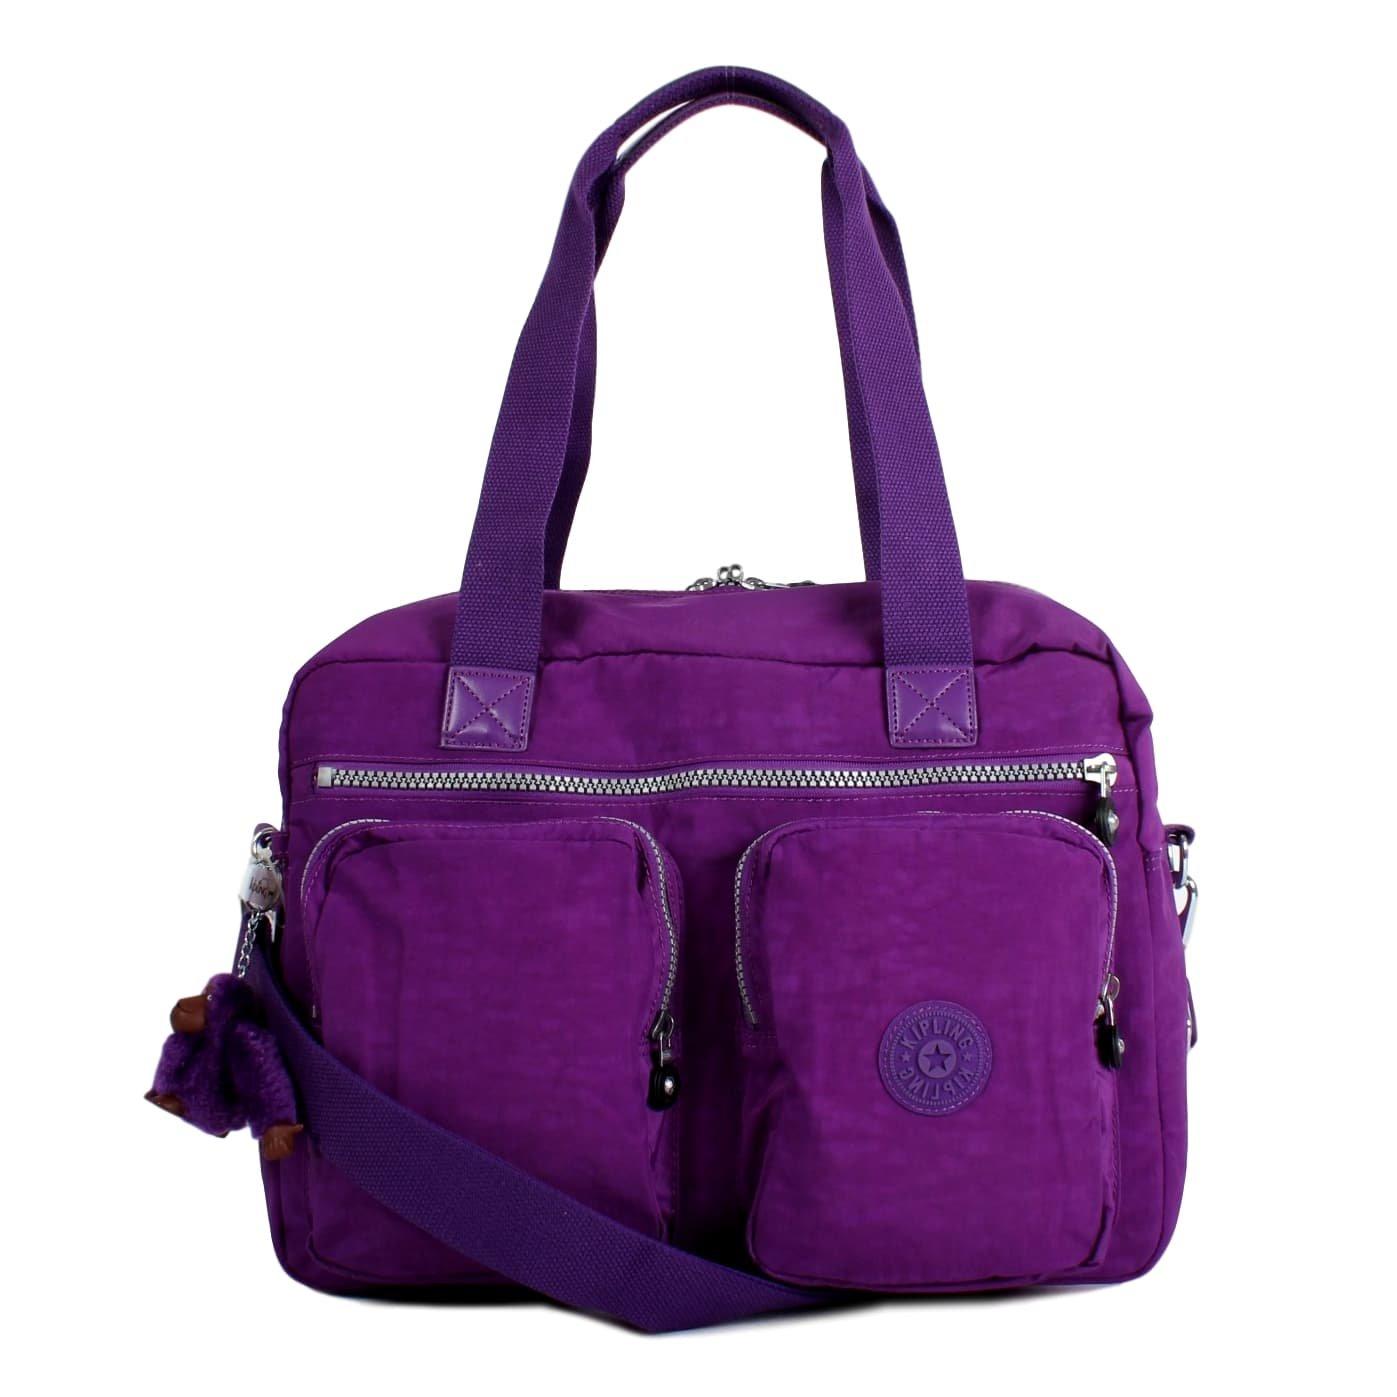 Kipling Sasha Travel Tote, One Size, Tile Purple